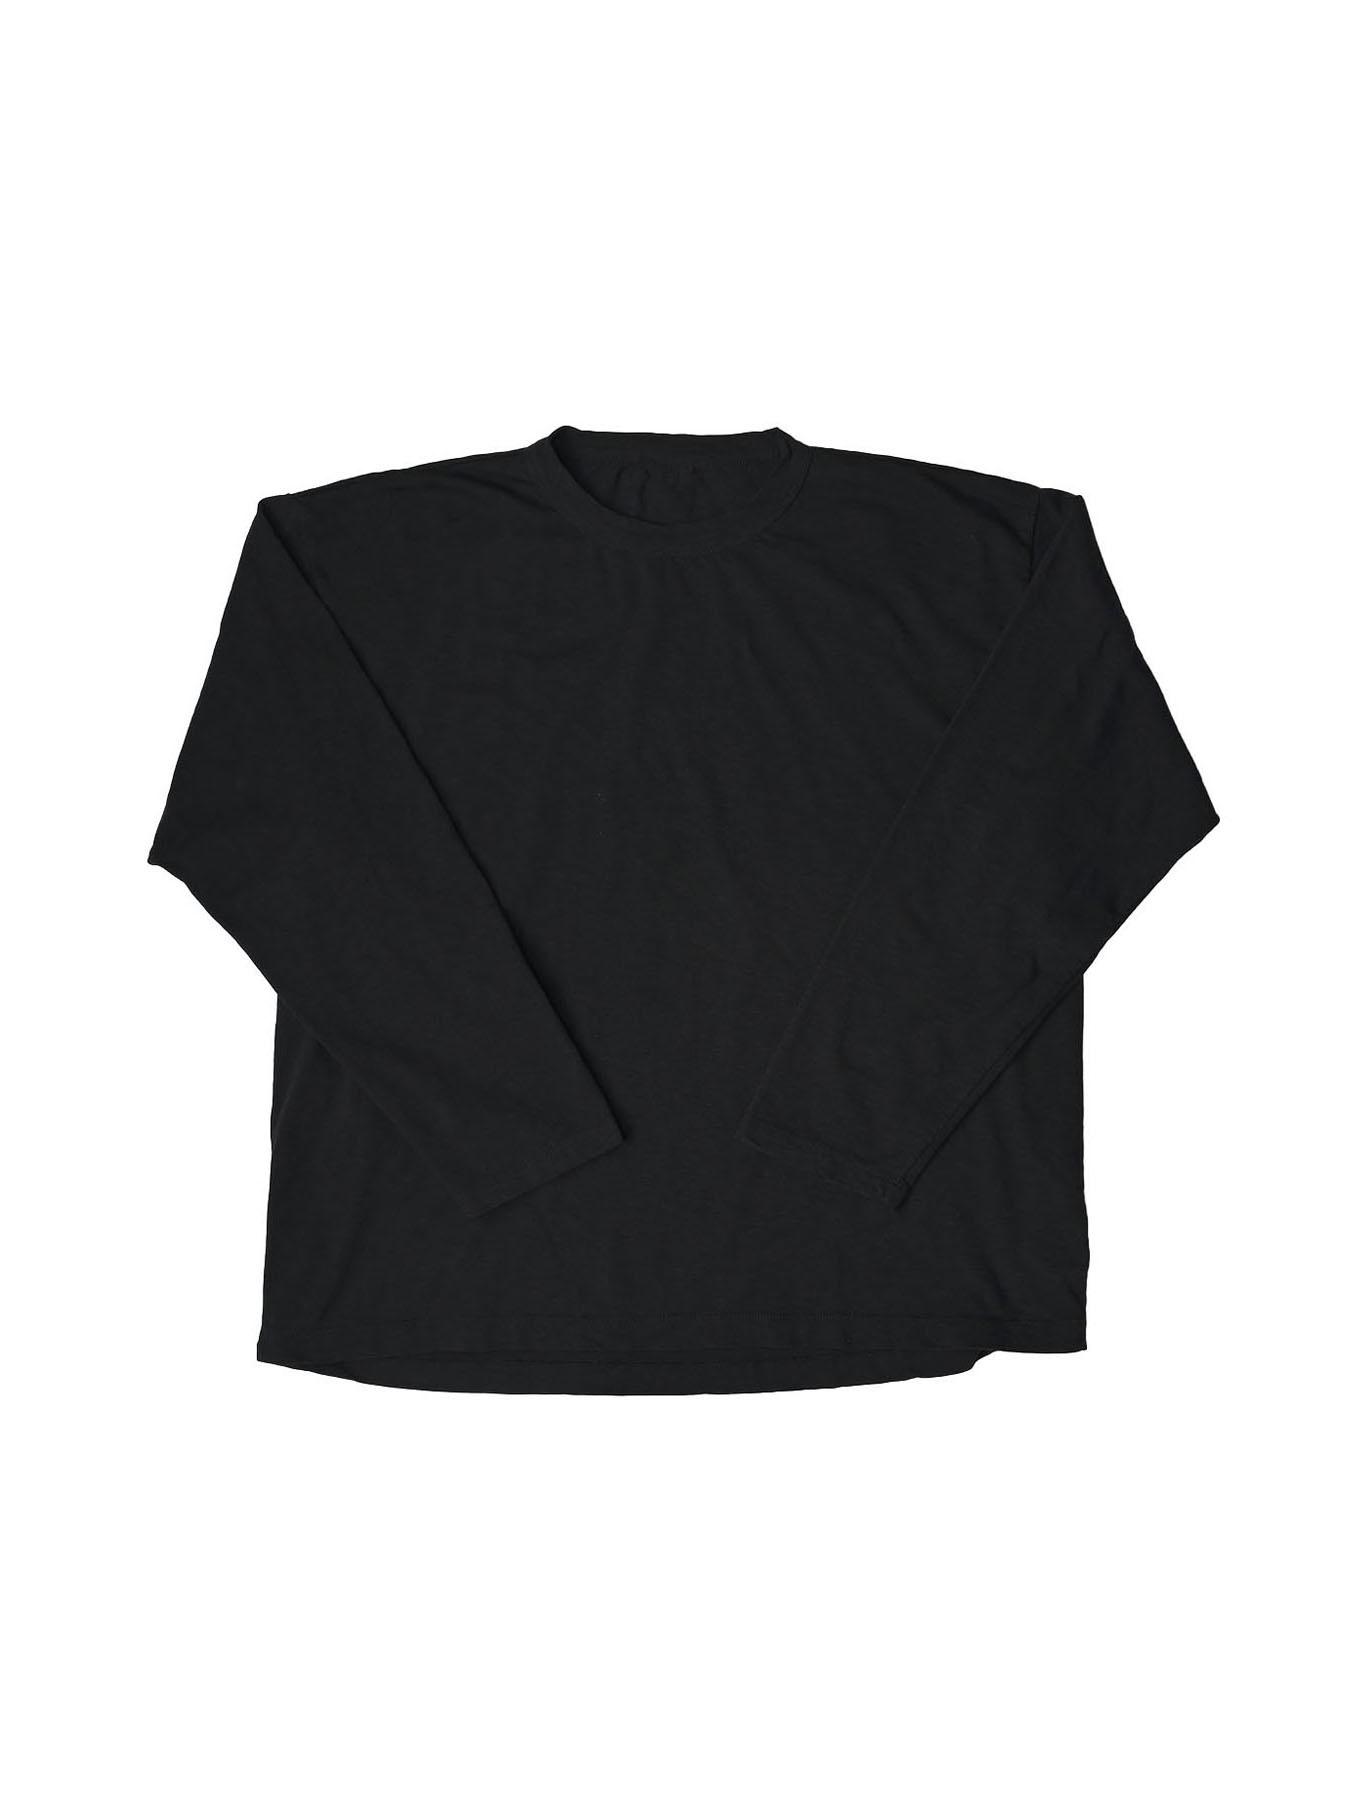 Zimbabwe Cotton Ocean Long-sleeved T-shirt-1